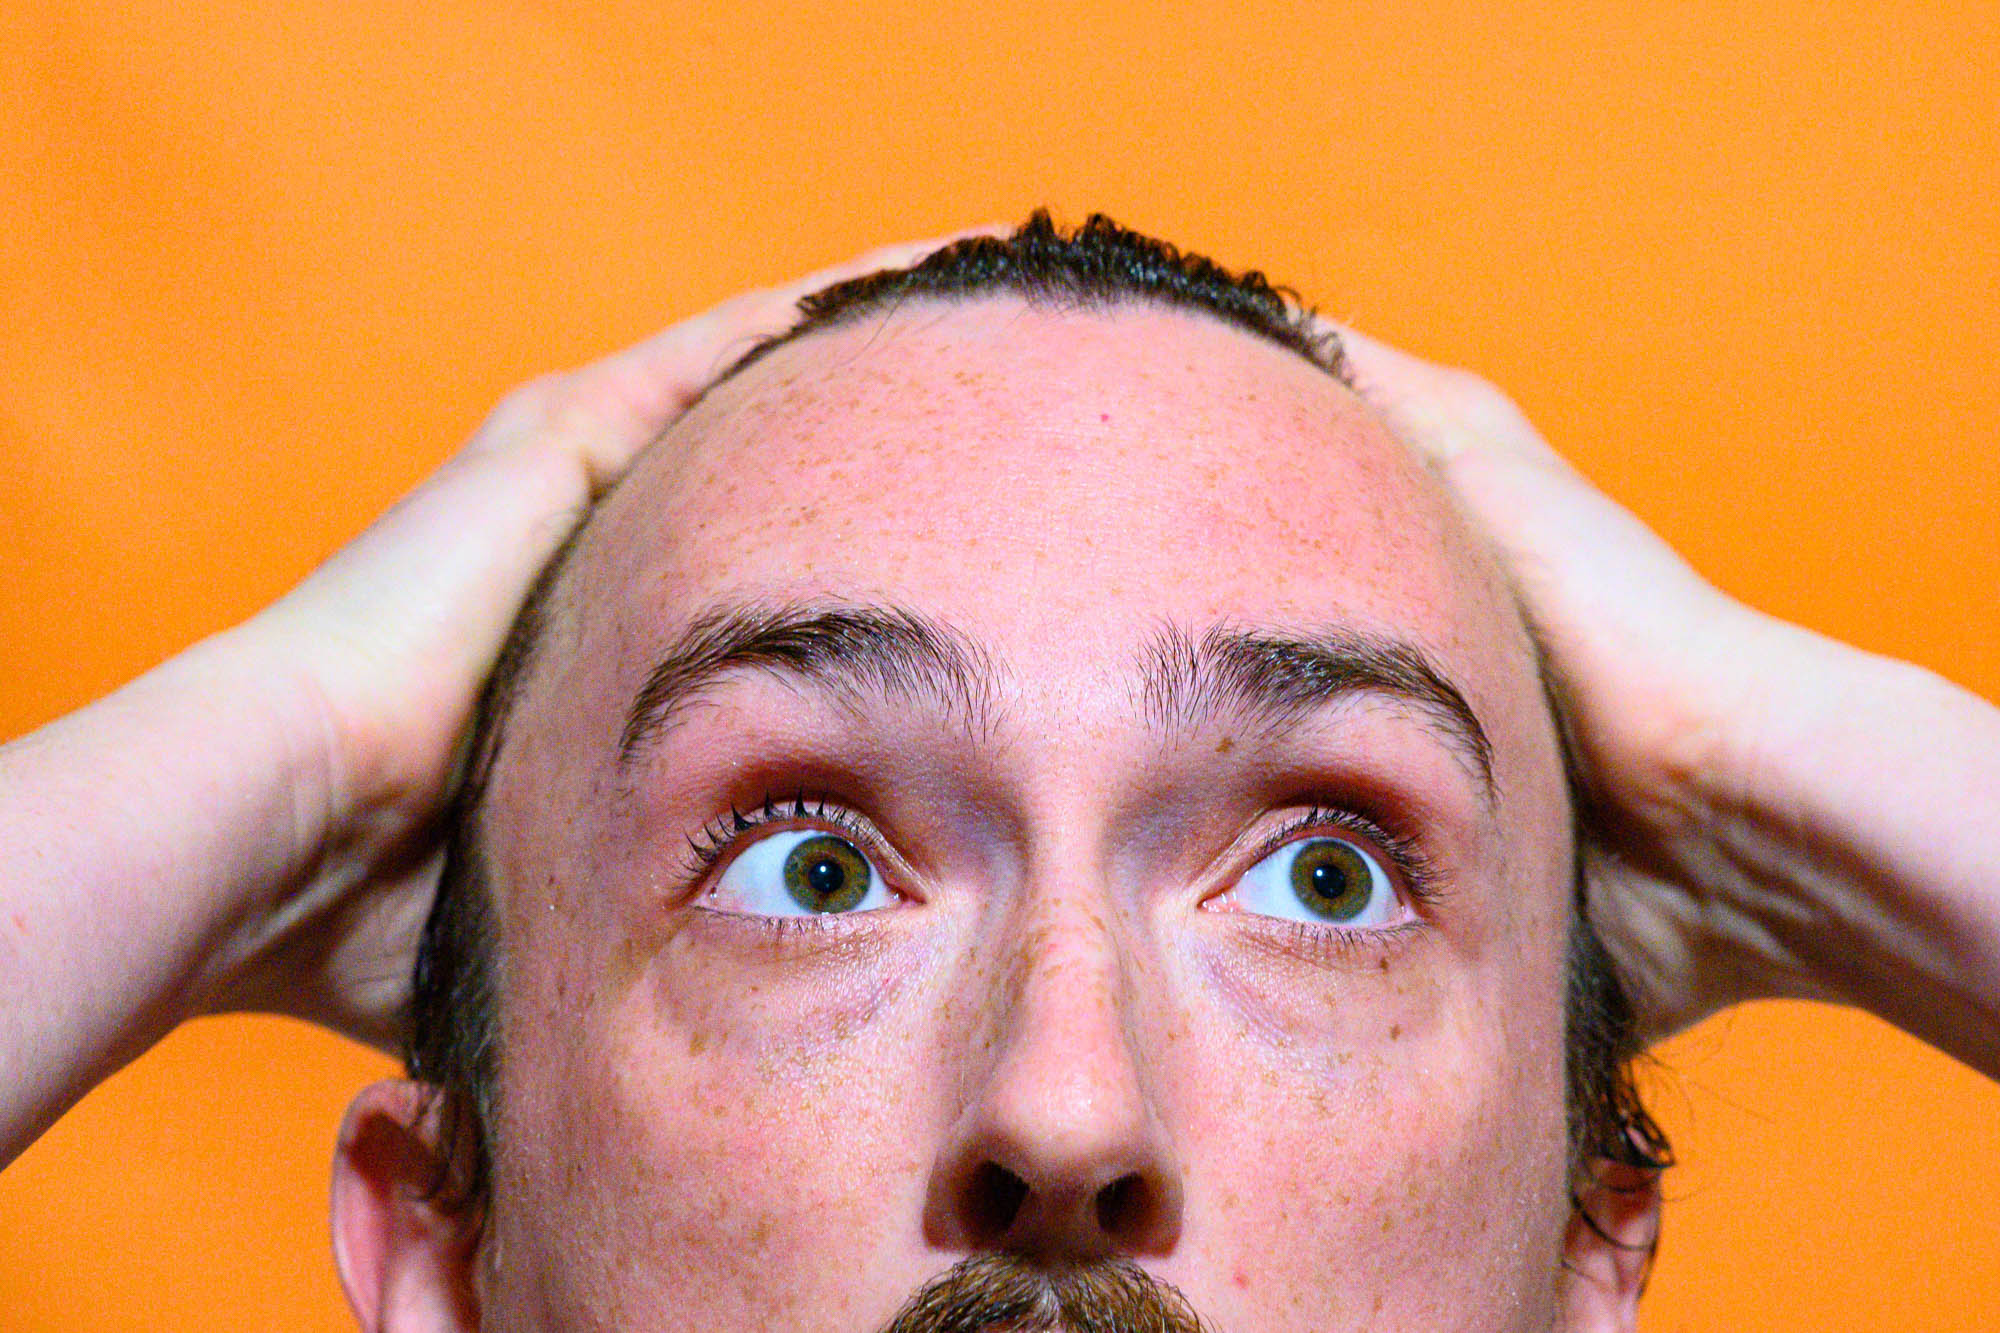 the artist runs his hands through his wet hair while standing against an orange backdrop